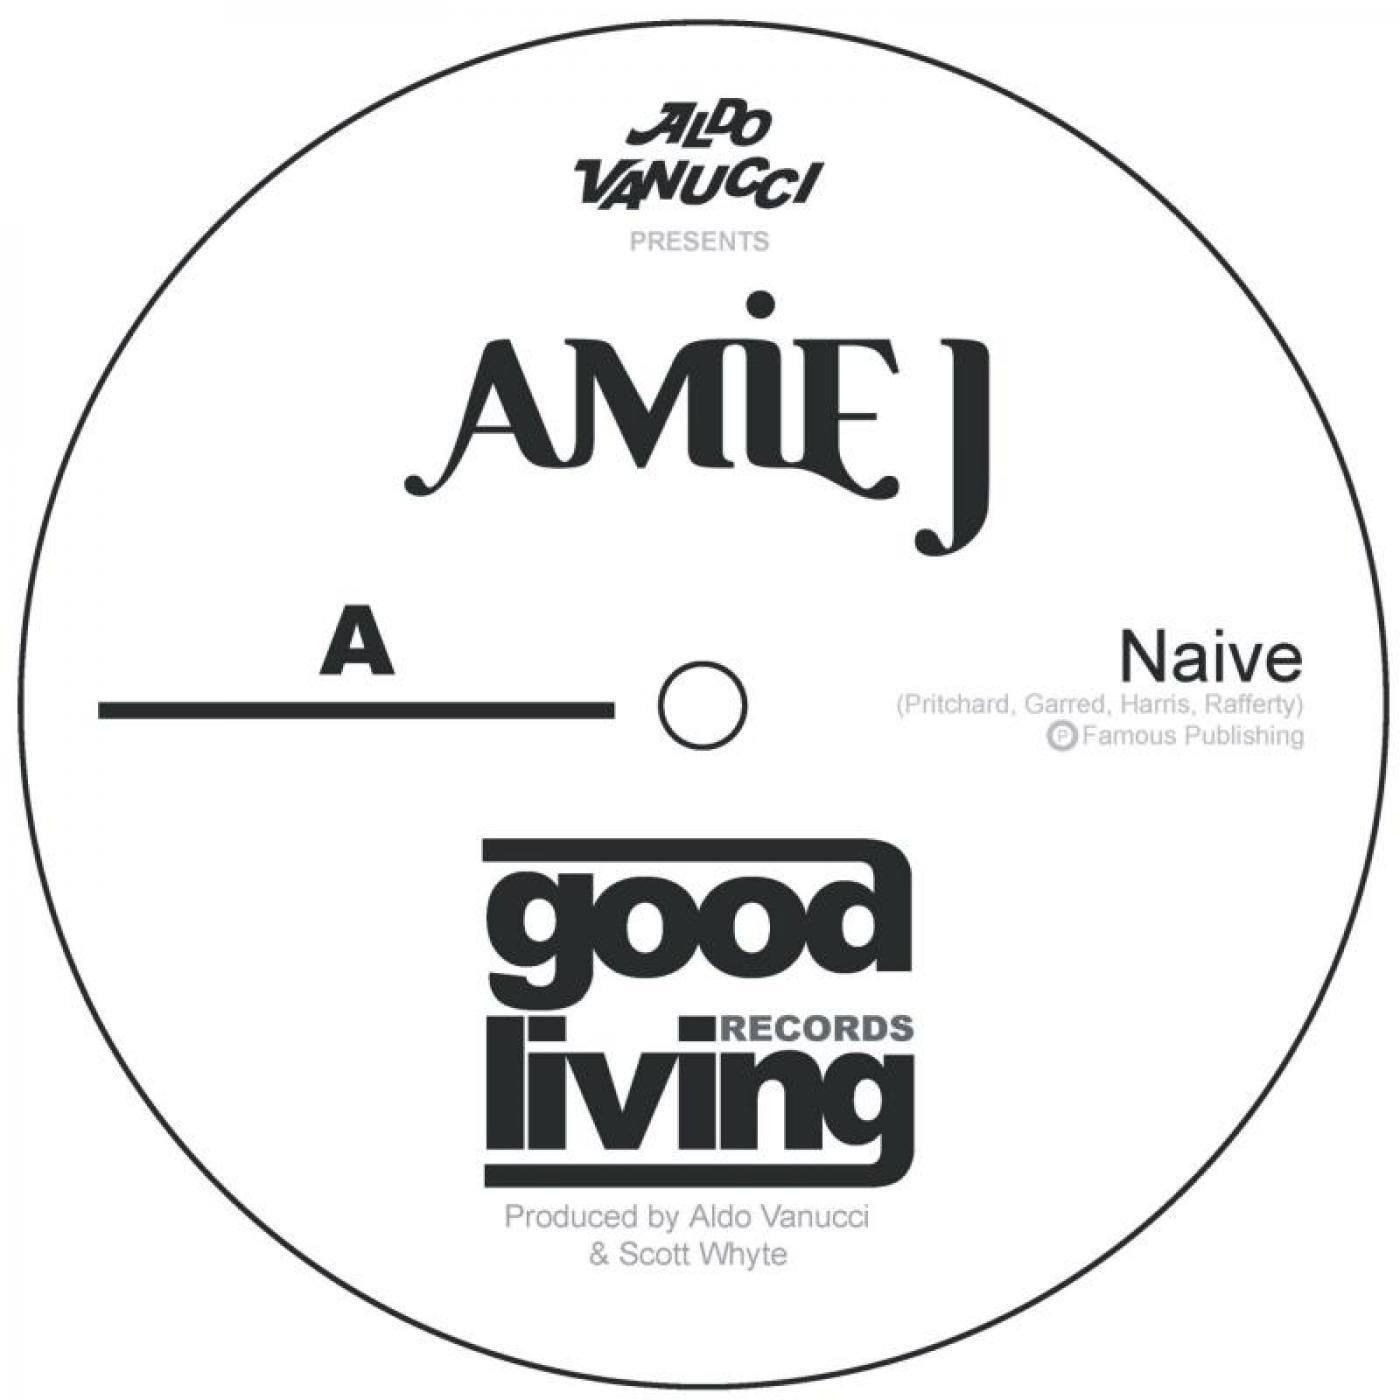 Na 239 Ve Aldo Vanucci Presents Amie J Amie J Amp Aldo